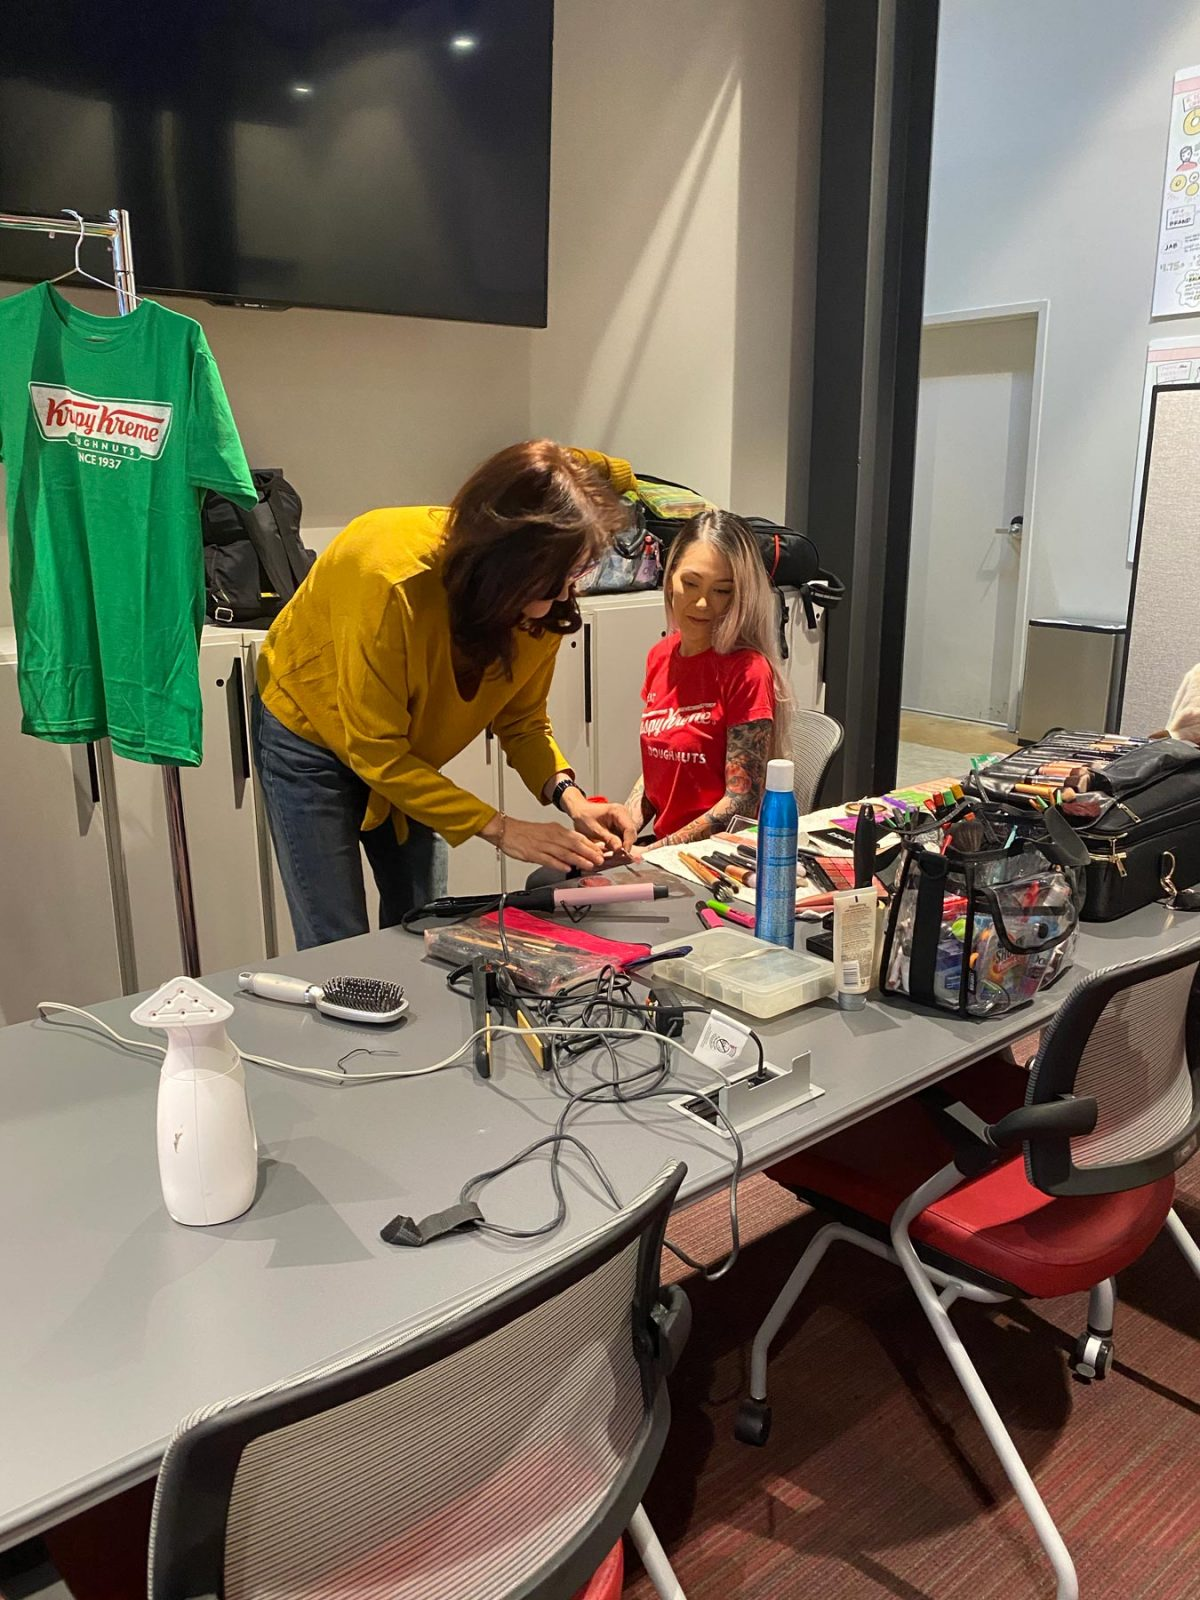 Makeup artist preparing a model for a photo shoot for Krispy Kreme Doughnuts